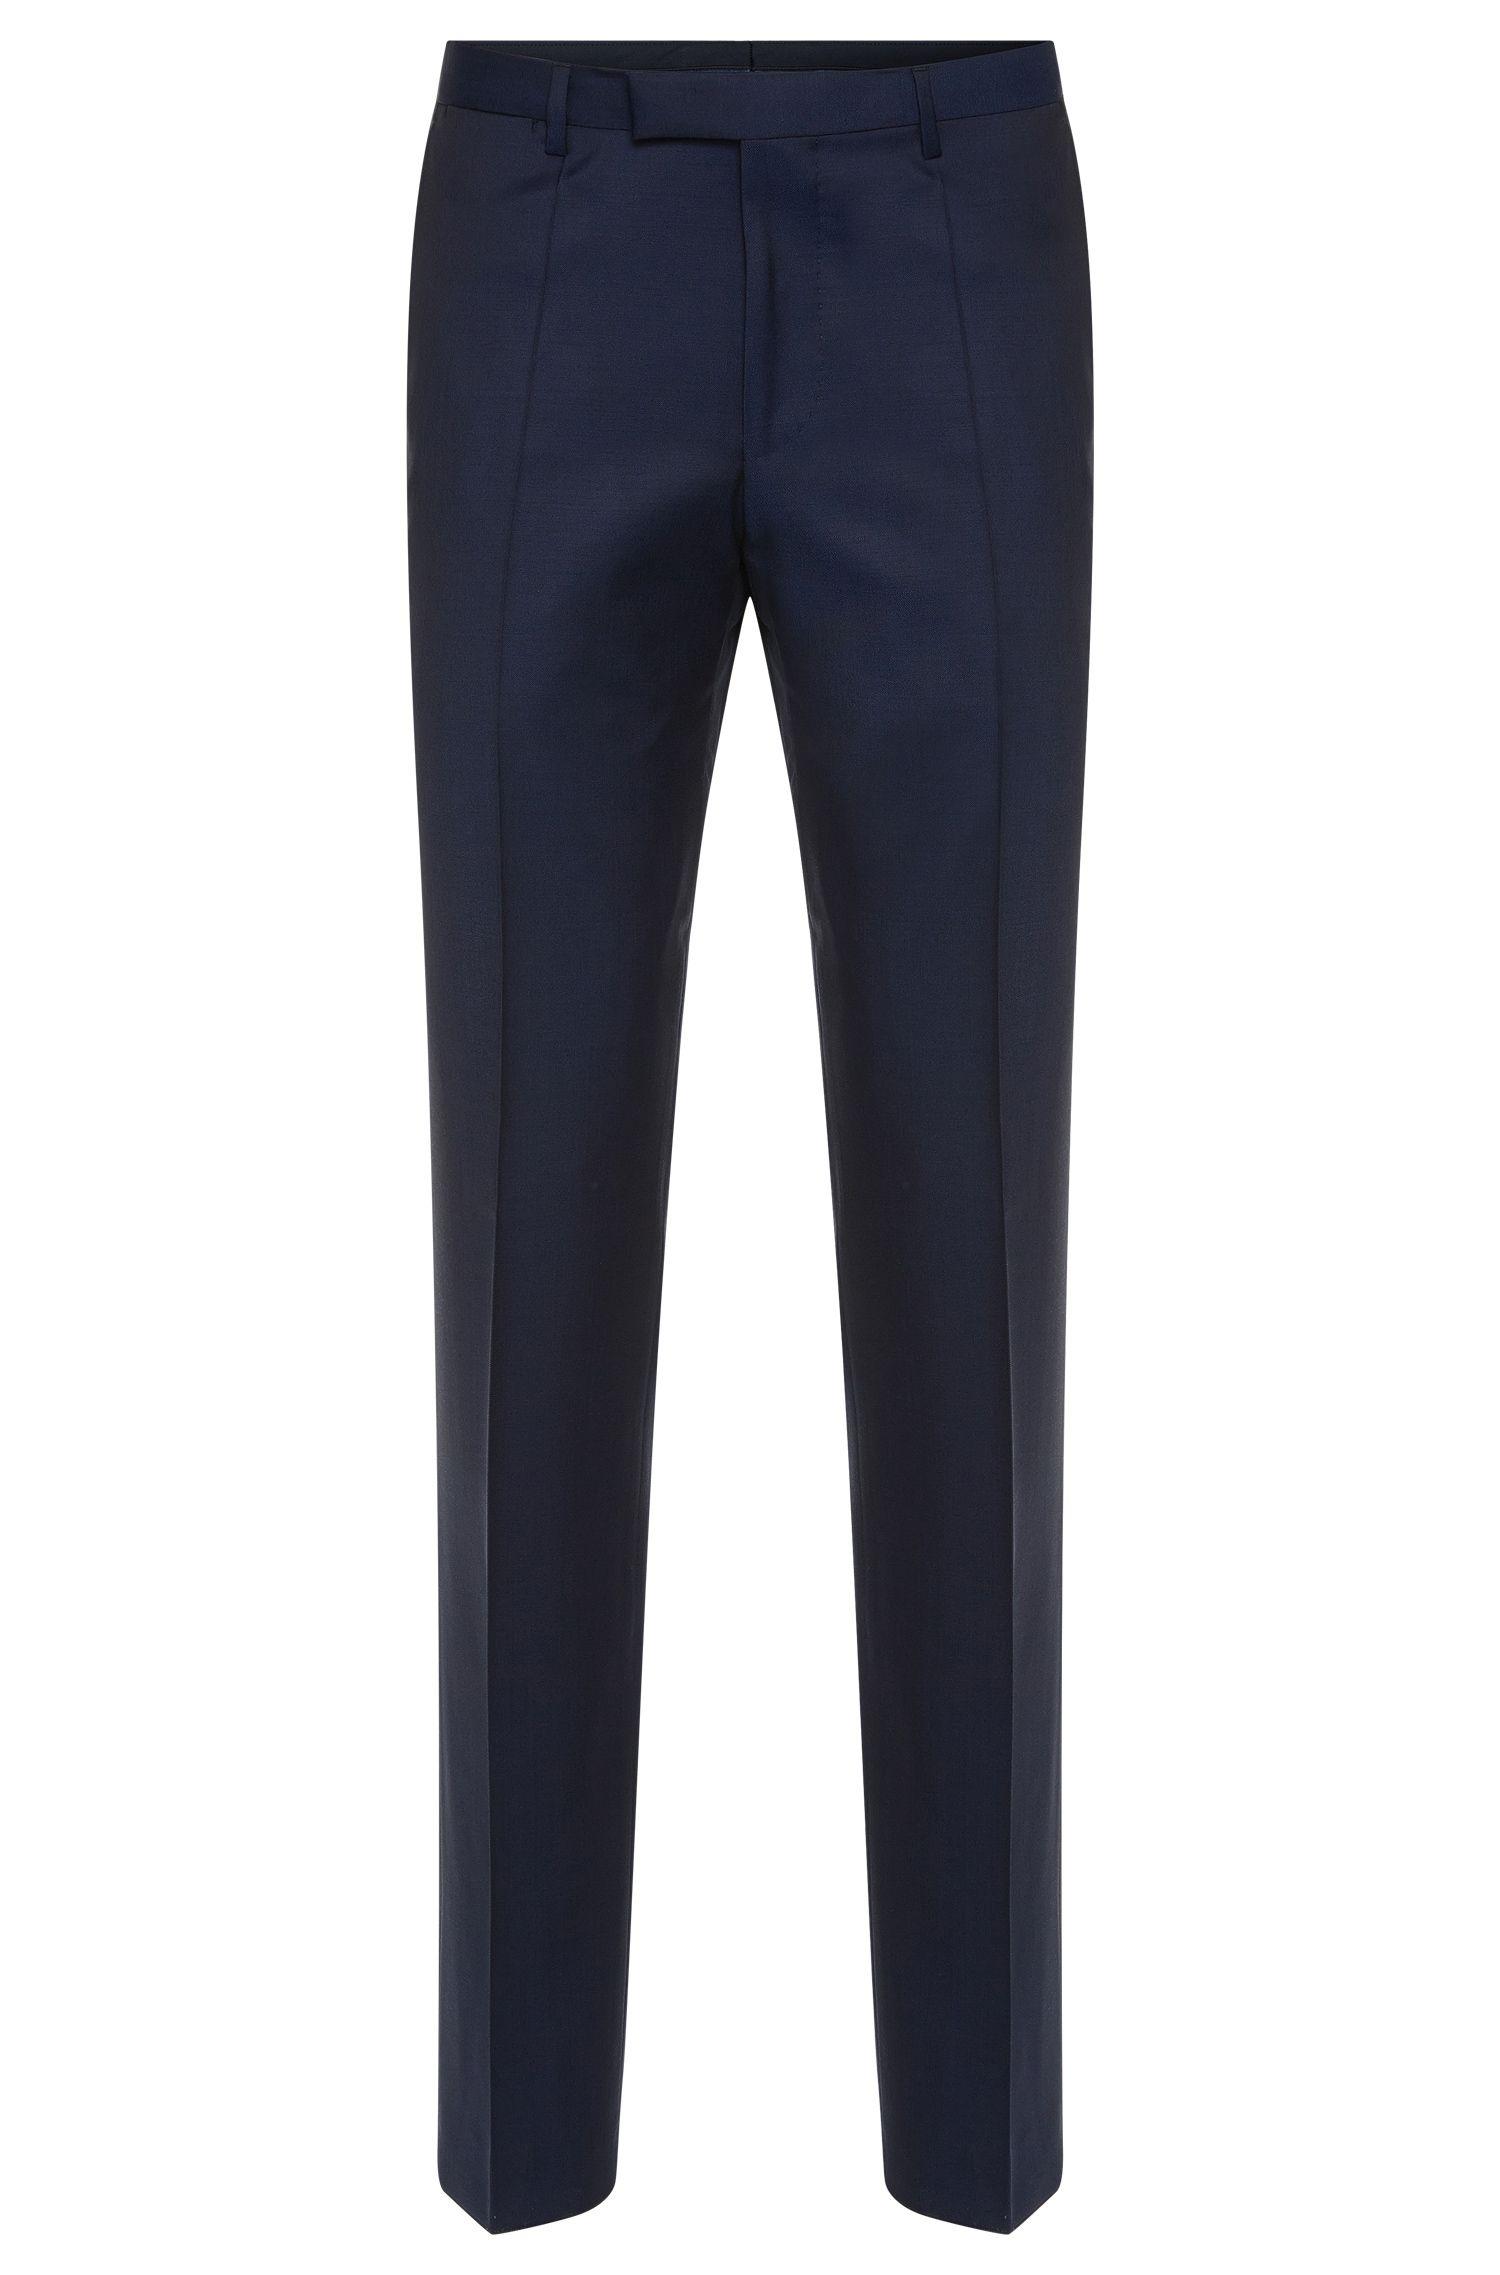 'Lightning' | Regular Fit, Italian Super 120 Virgin Wool Dress Pants